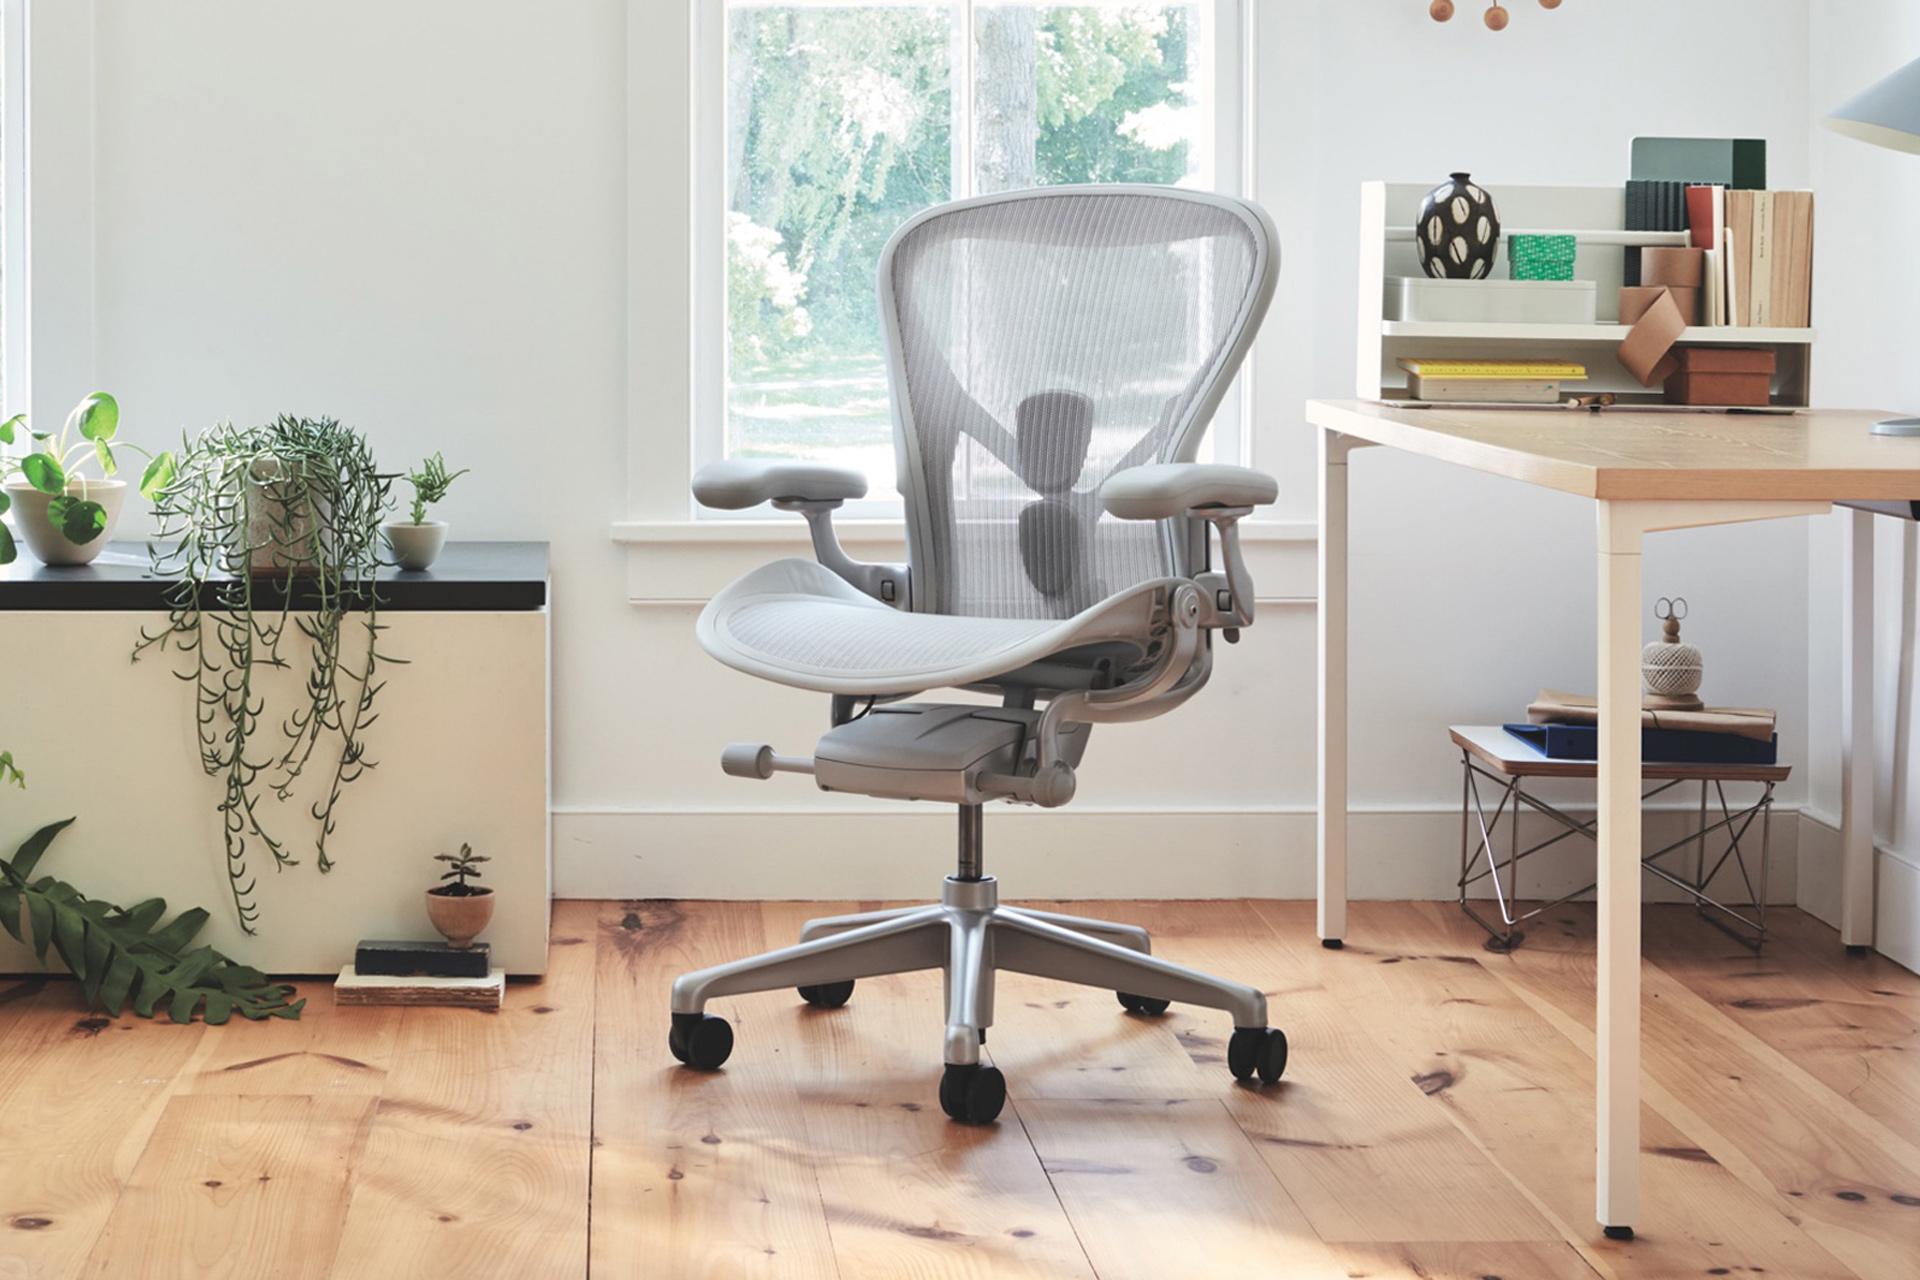 Claves para crear un Home Office eficiente